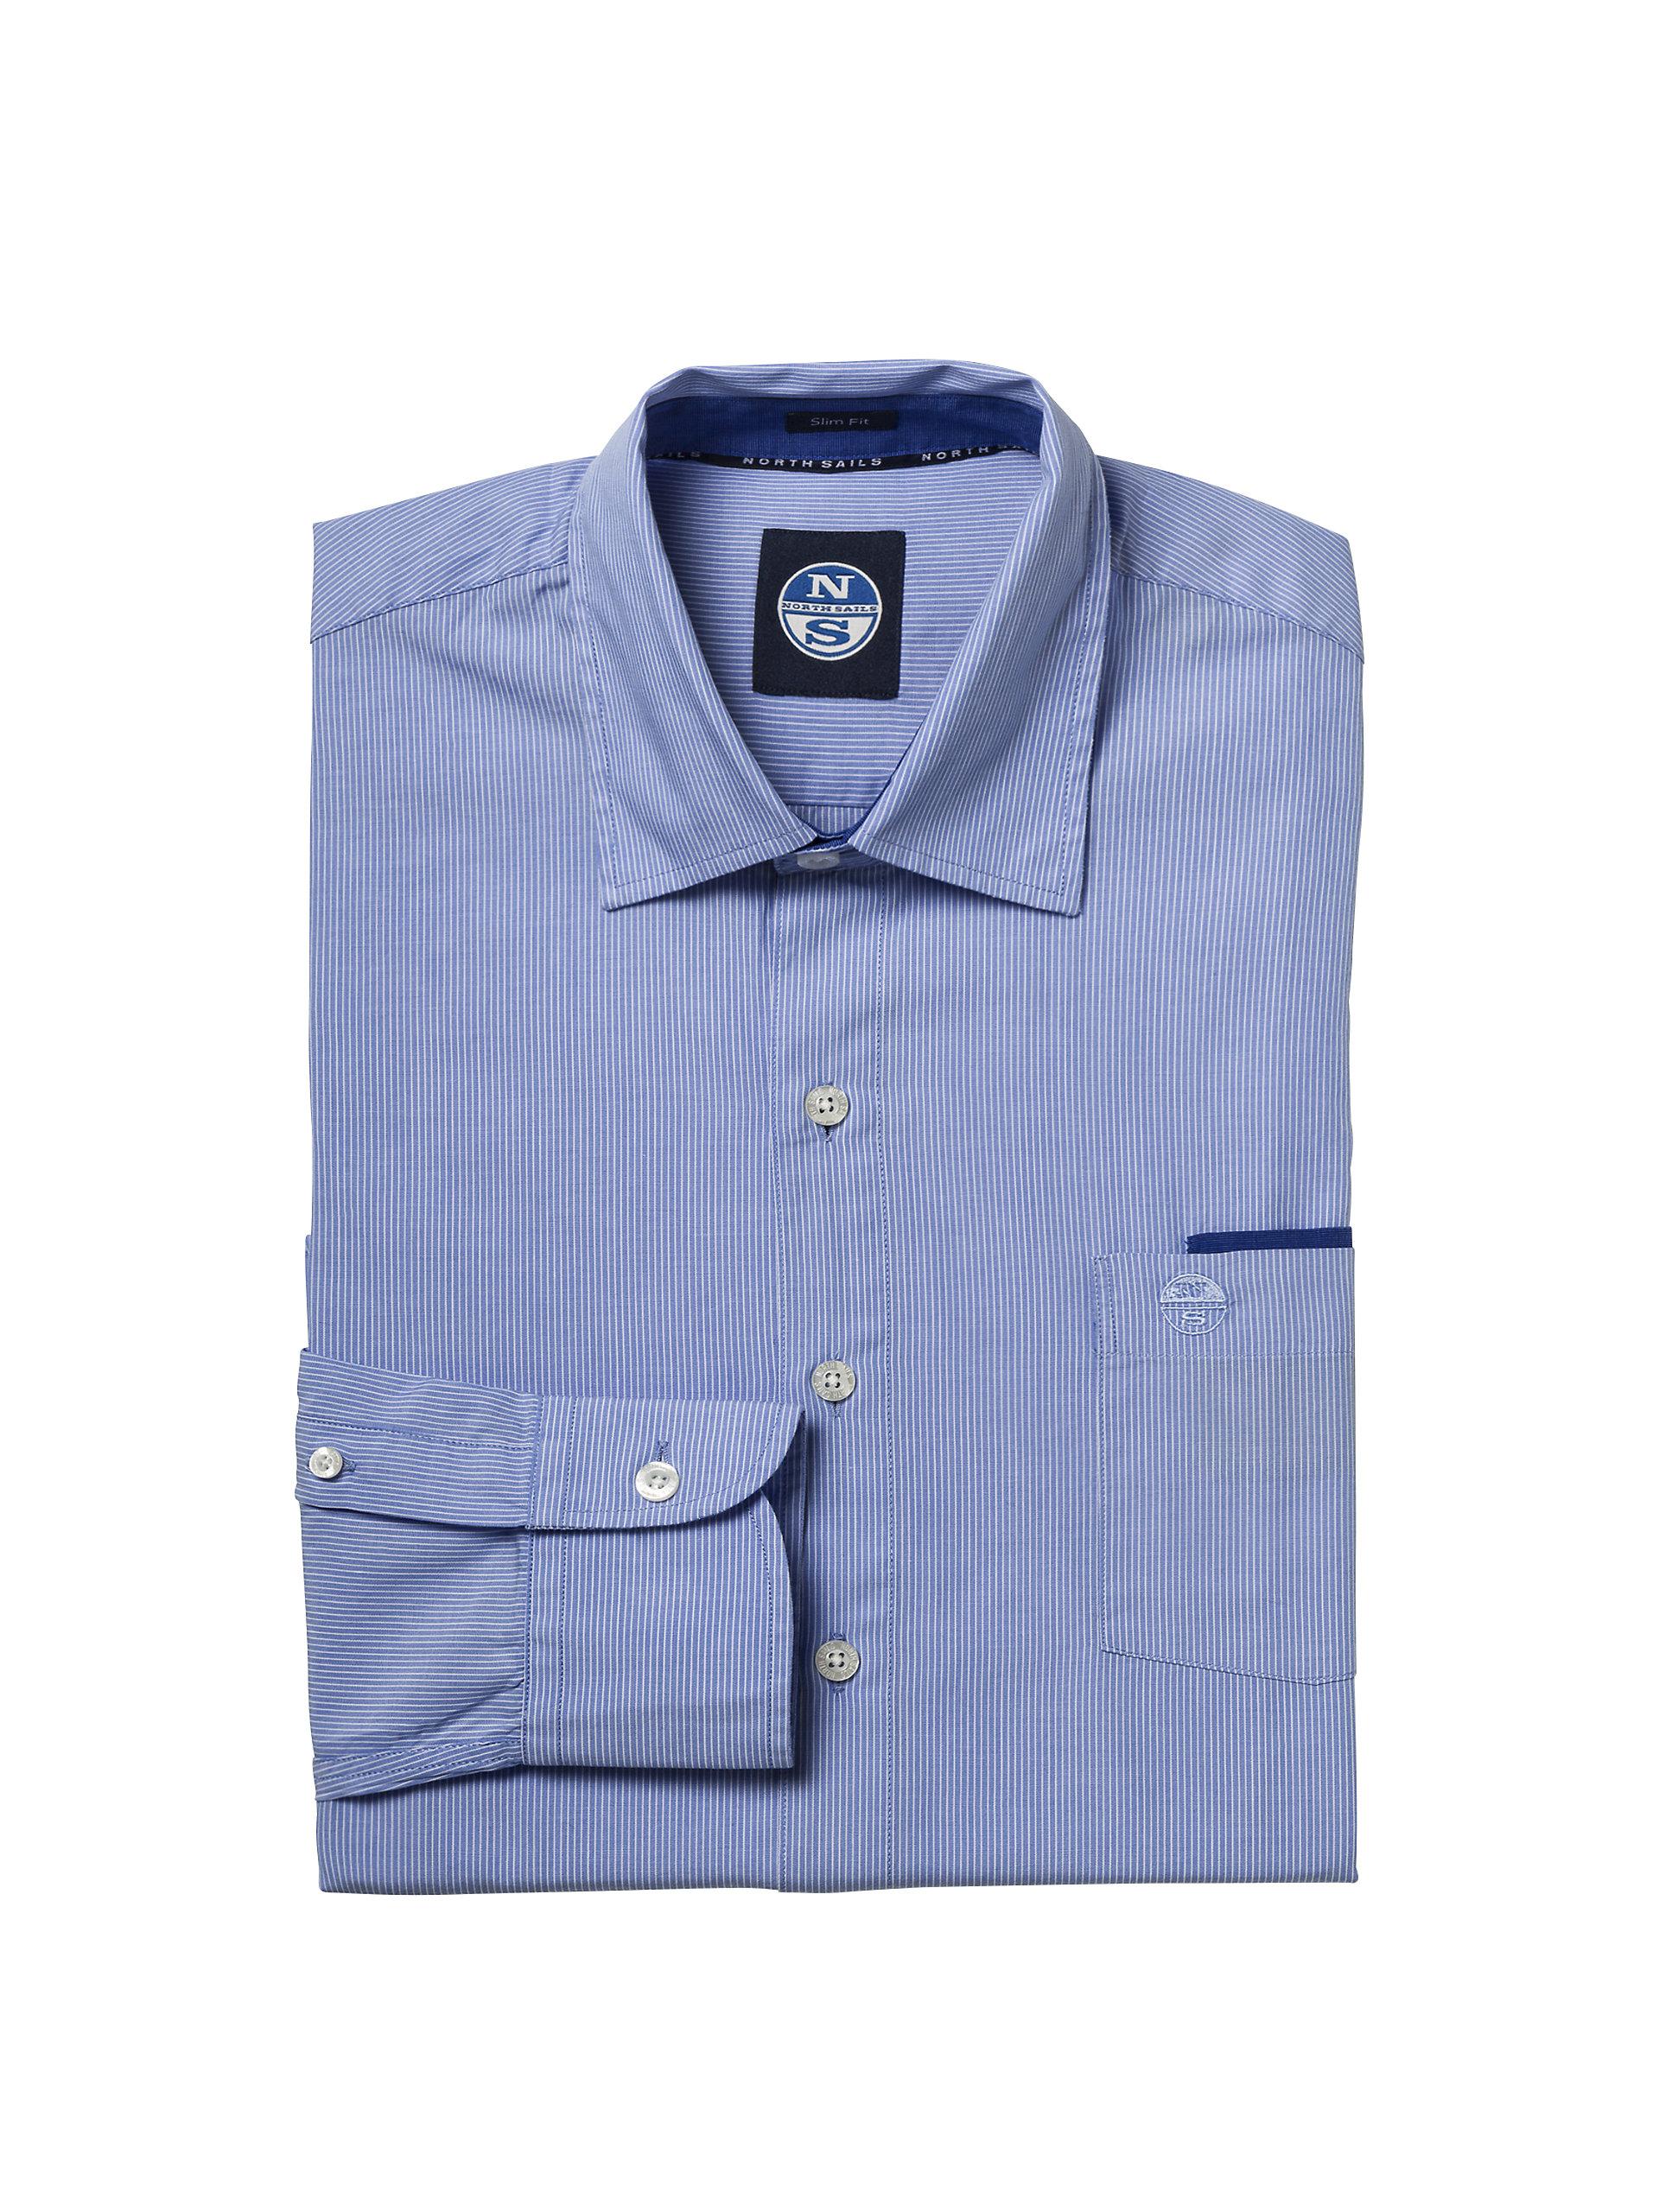 North Sails Mens Slim Poplin Striped Long-Sleeved Shirt Enzyme Washed